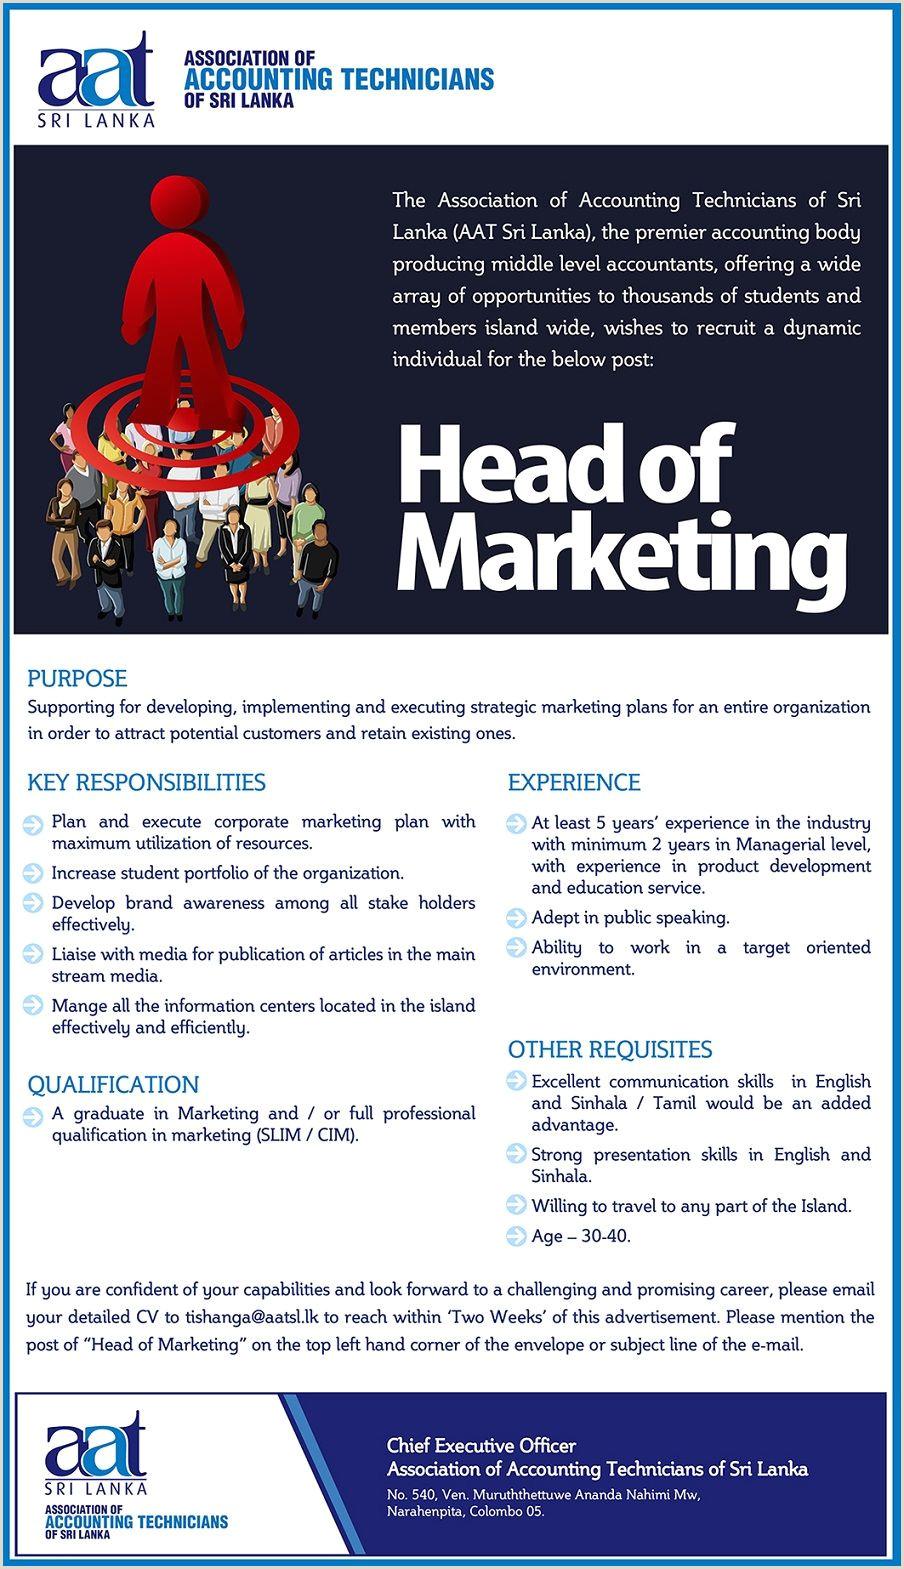 Cv Format For Job Sinhala Head Of Marketing At Association Of Accounting Technicians